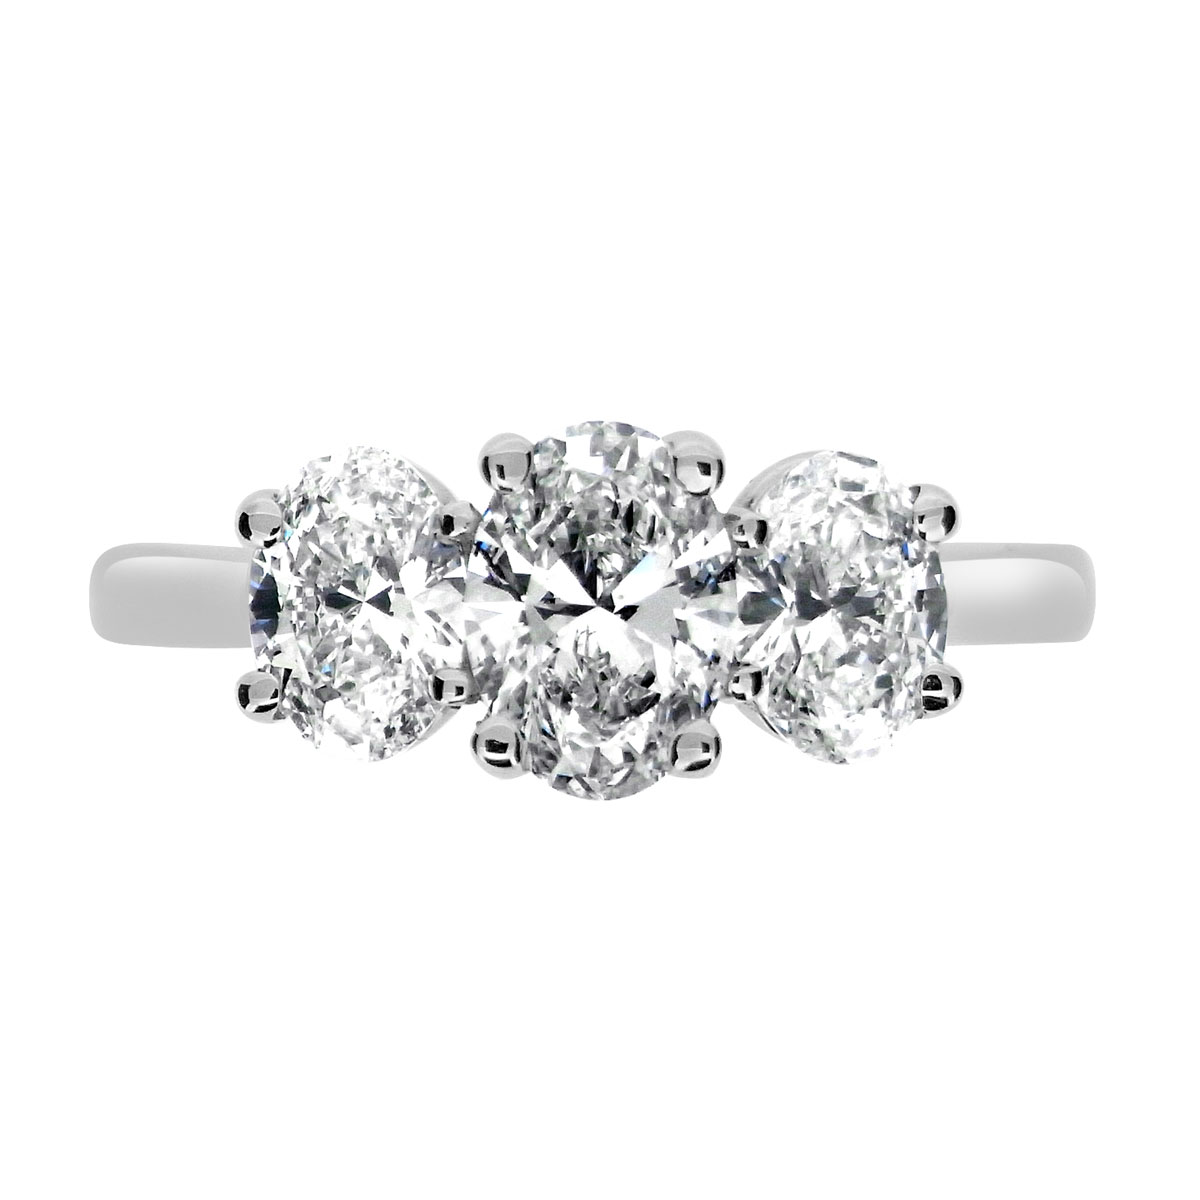 1.74ct Platinum Mounted Oval 3 Stone Diamond Ring